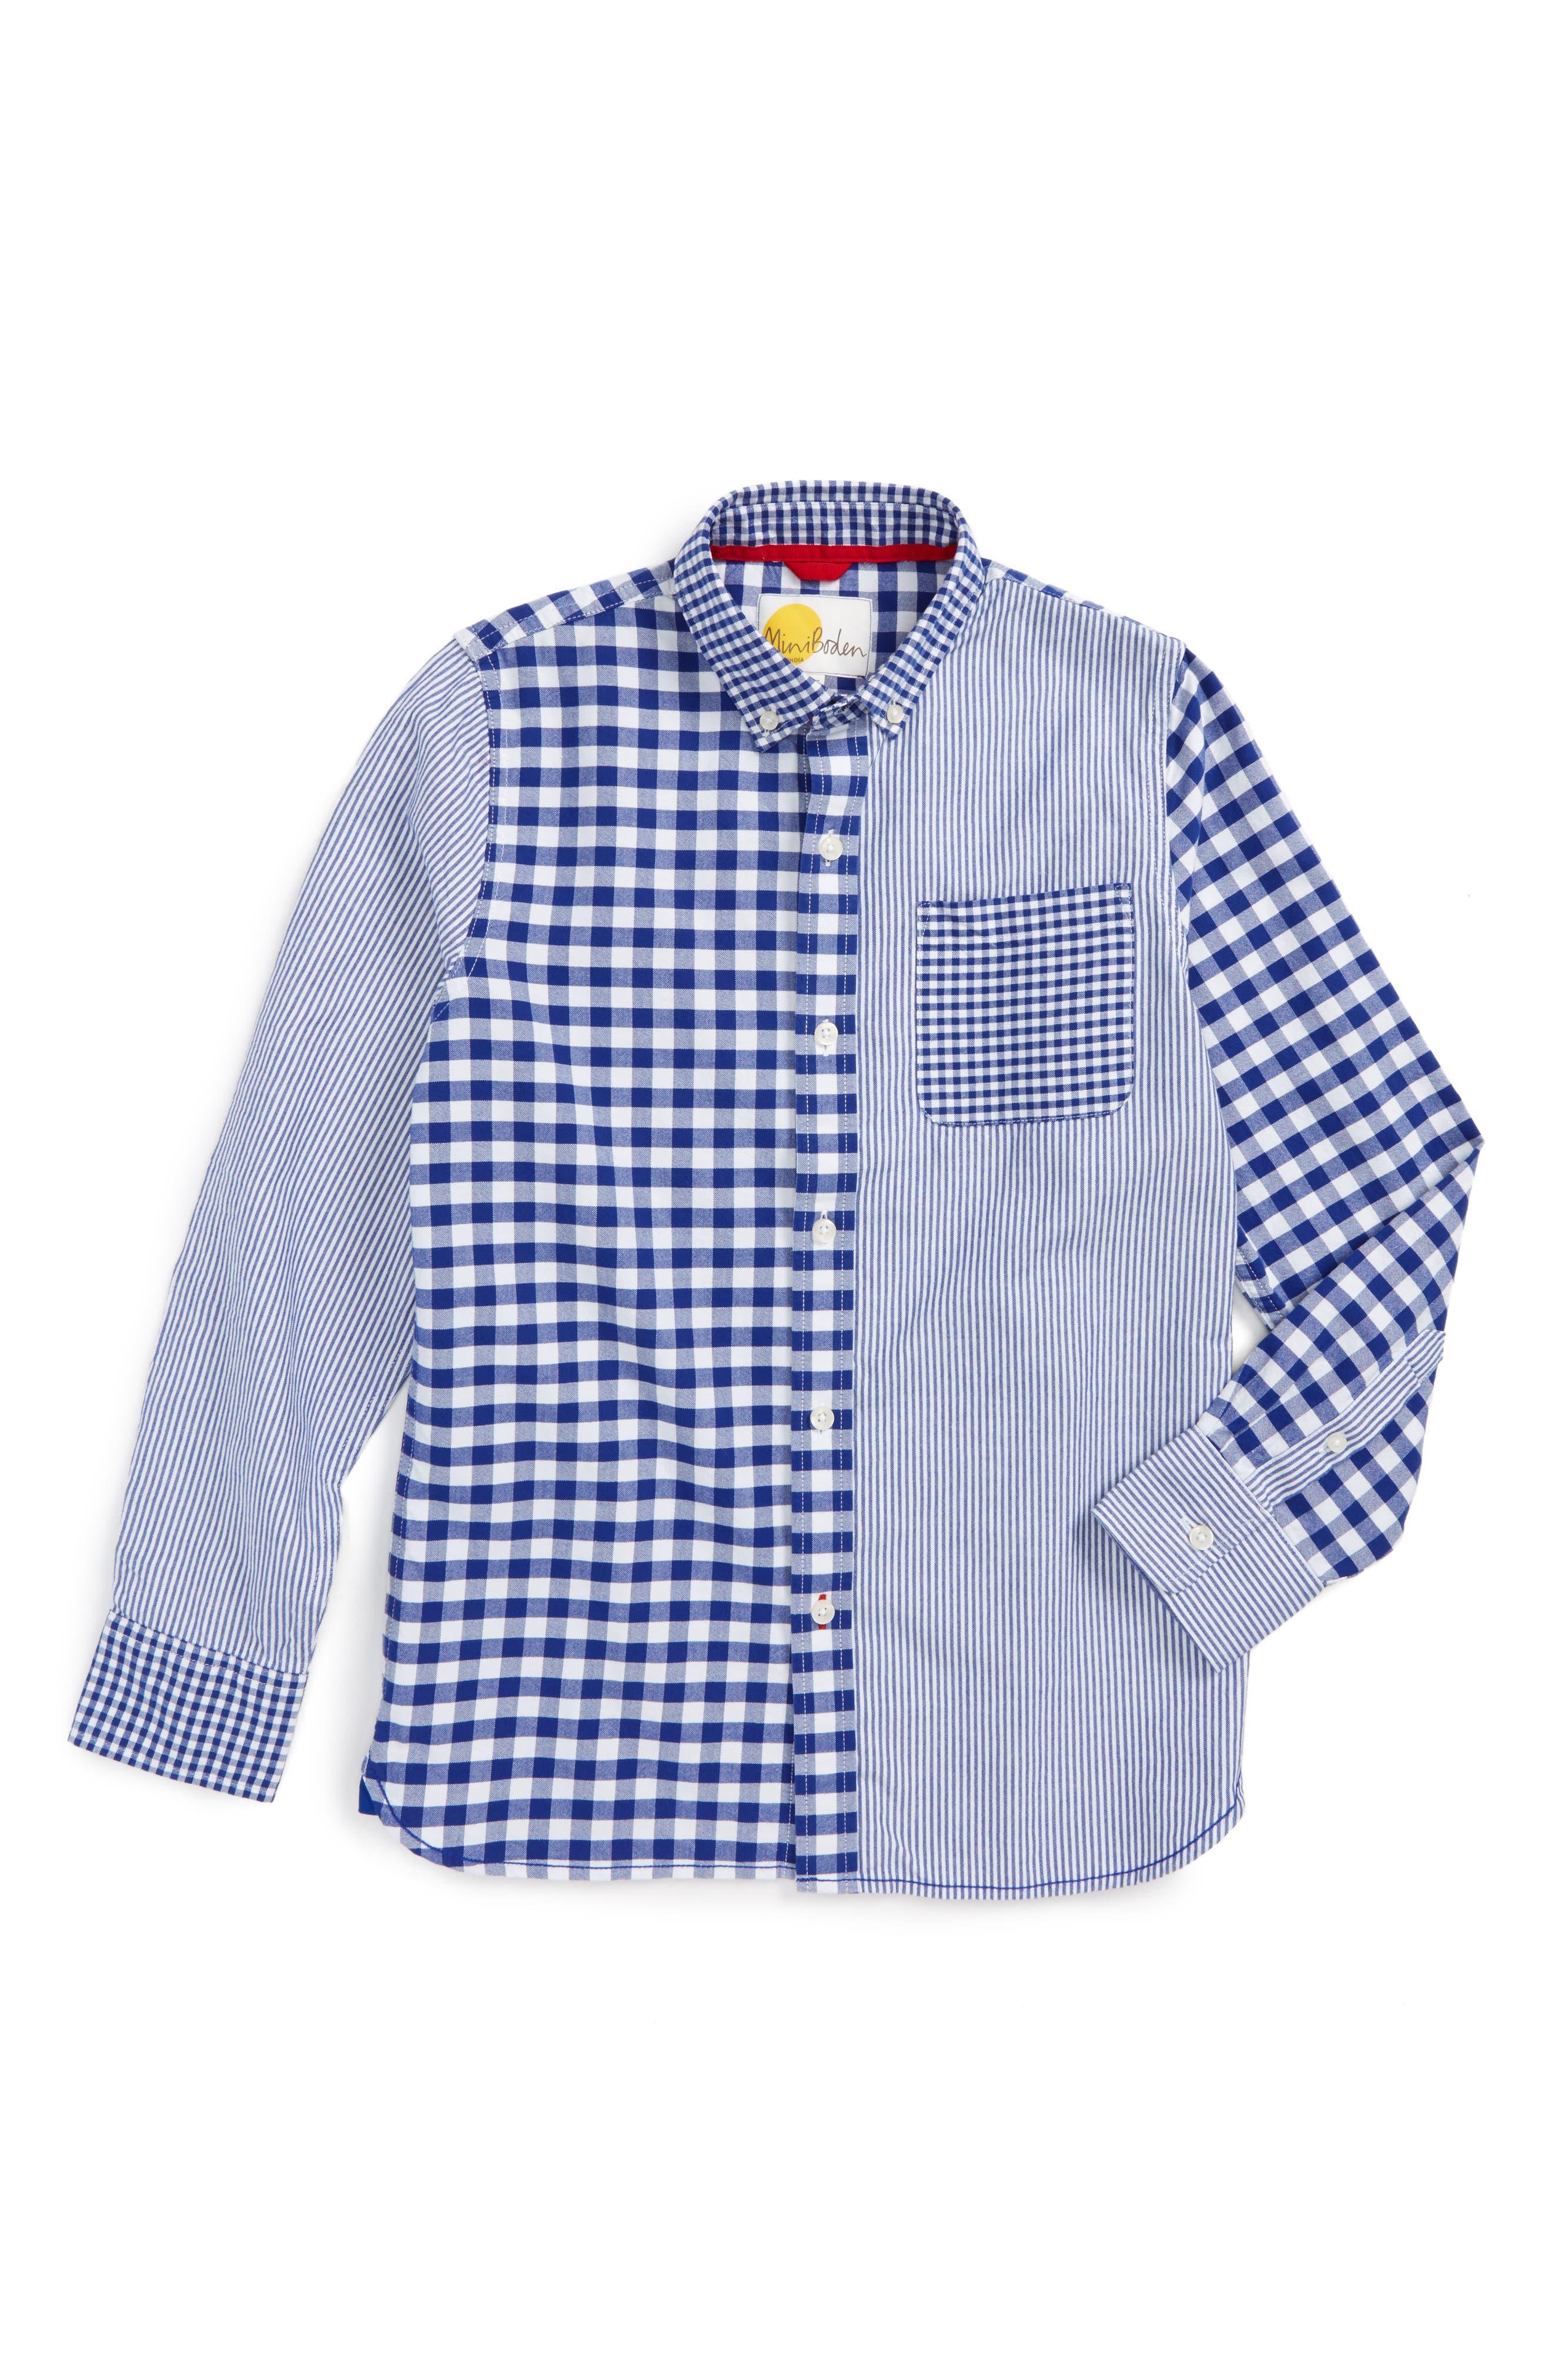 Mini Boden Hotchpotch Mixed Pattern Dress Shirt (Toddler Boys, Little Boys & Big Boys)